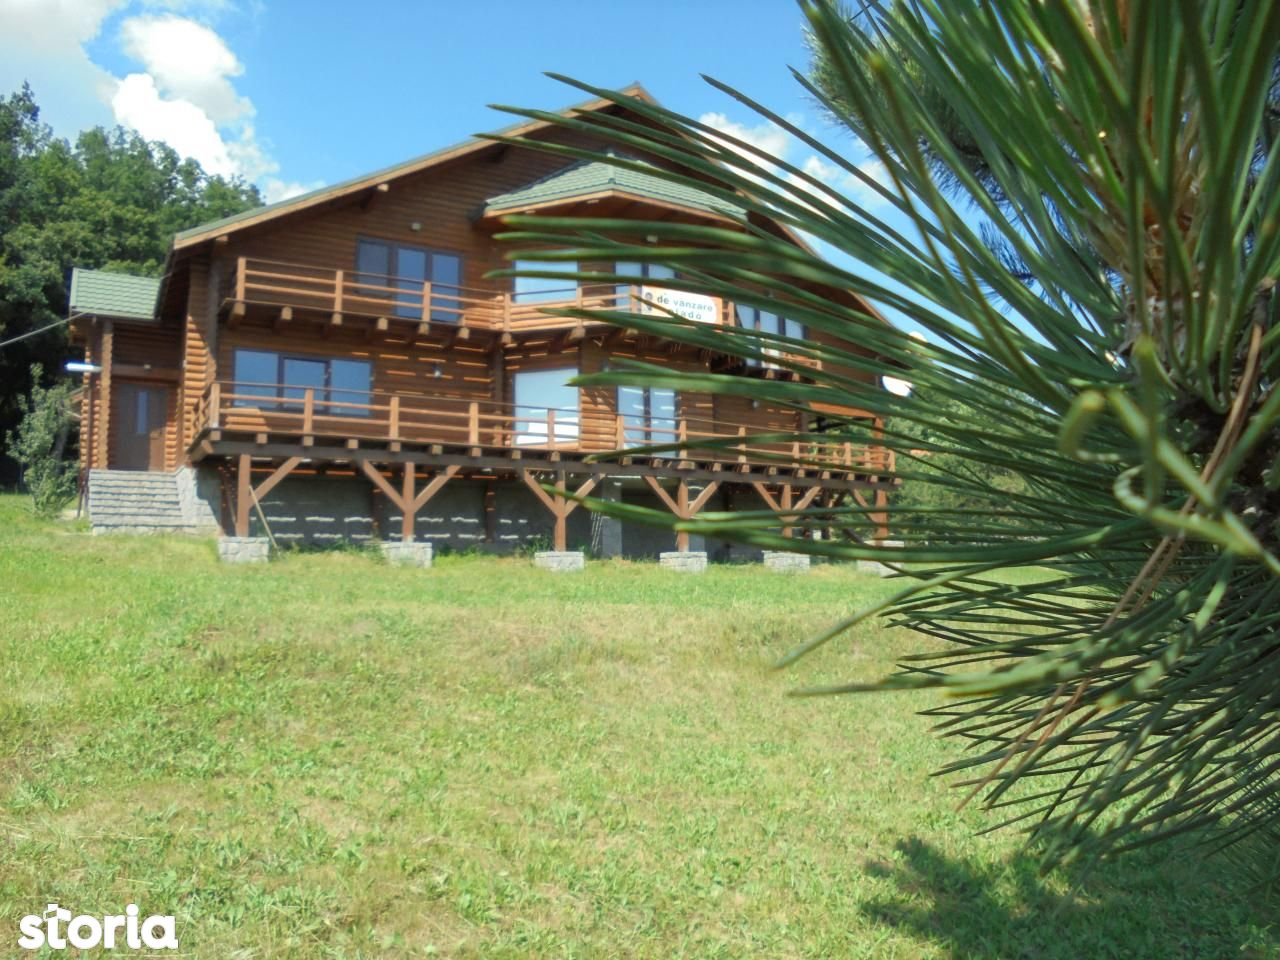 Casa de vanzare, Covasna (judet), Sfântu Gheorghe - Foto 1